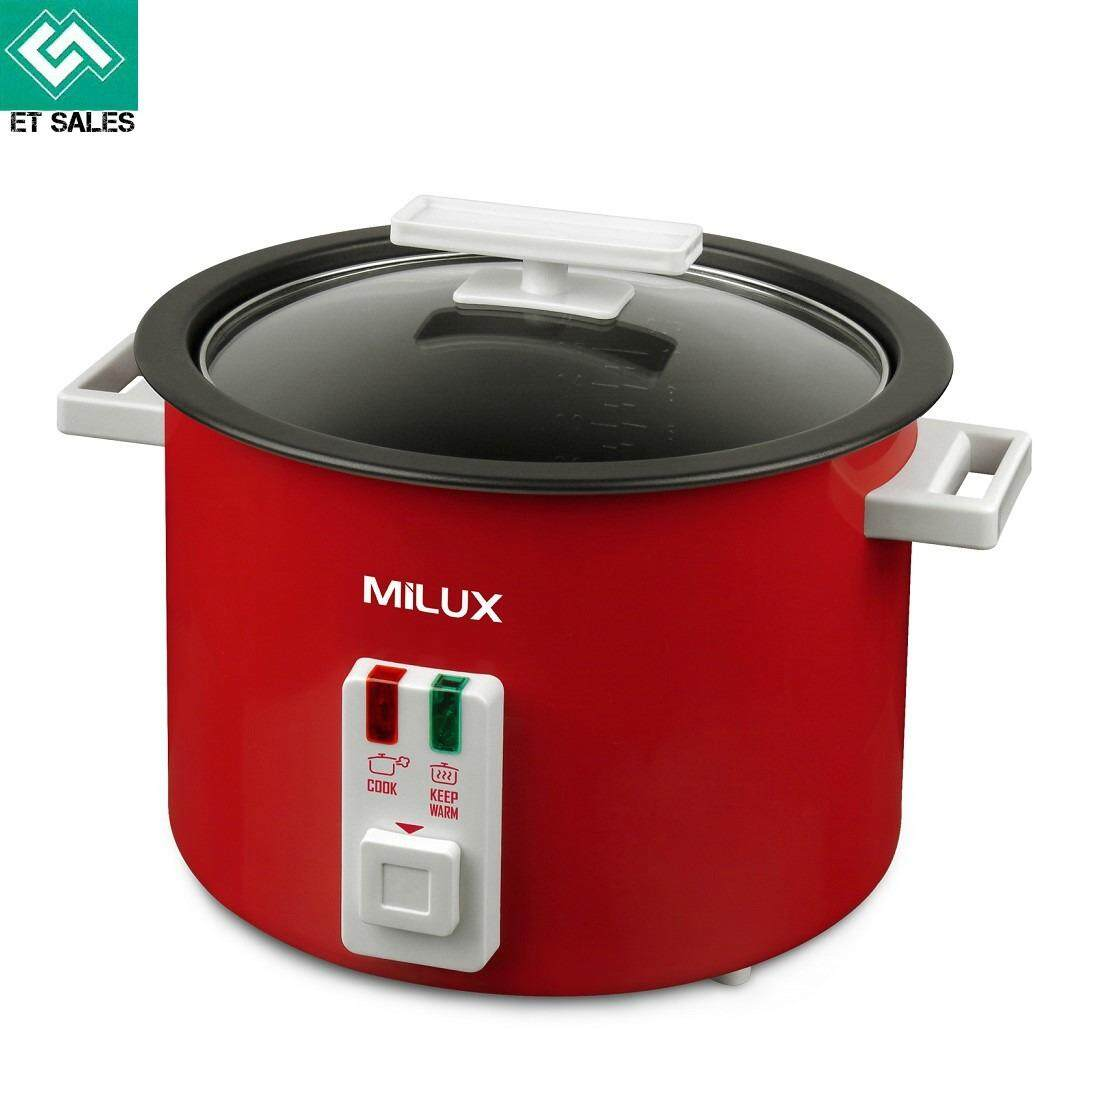 Milux 1.8L Rice Cooker *Non-Stick Pot* (MRC718) Red